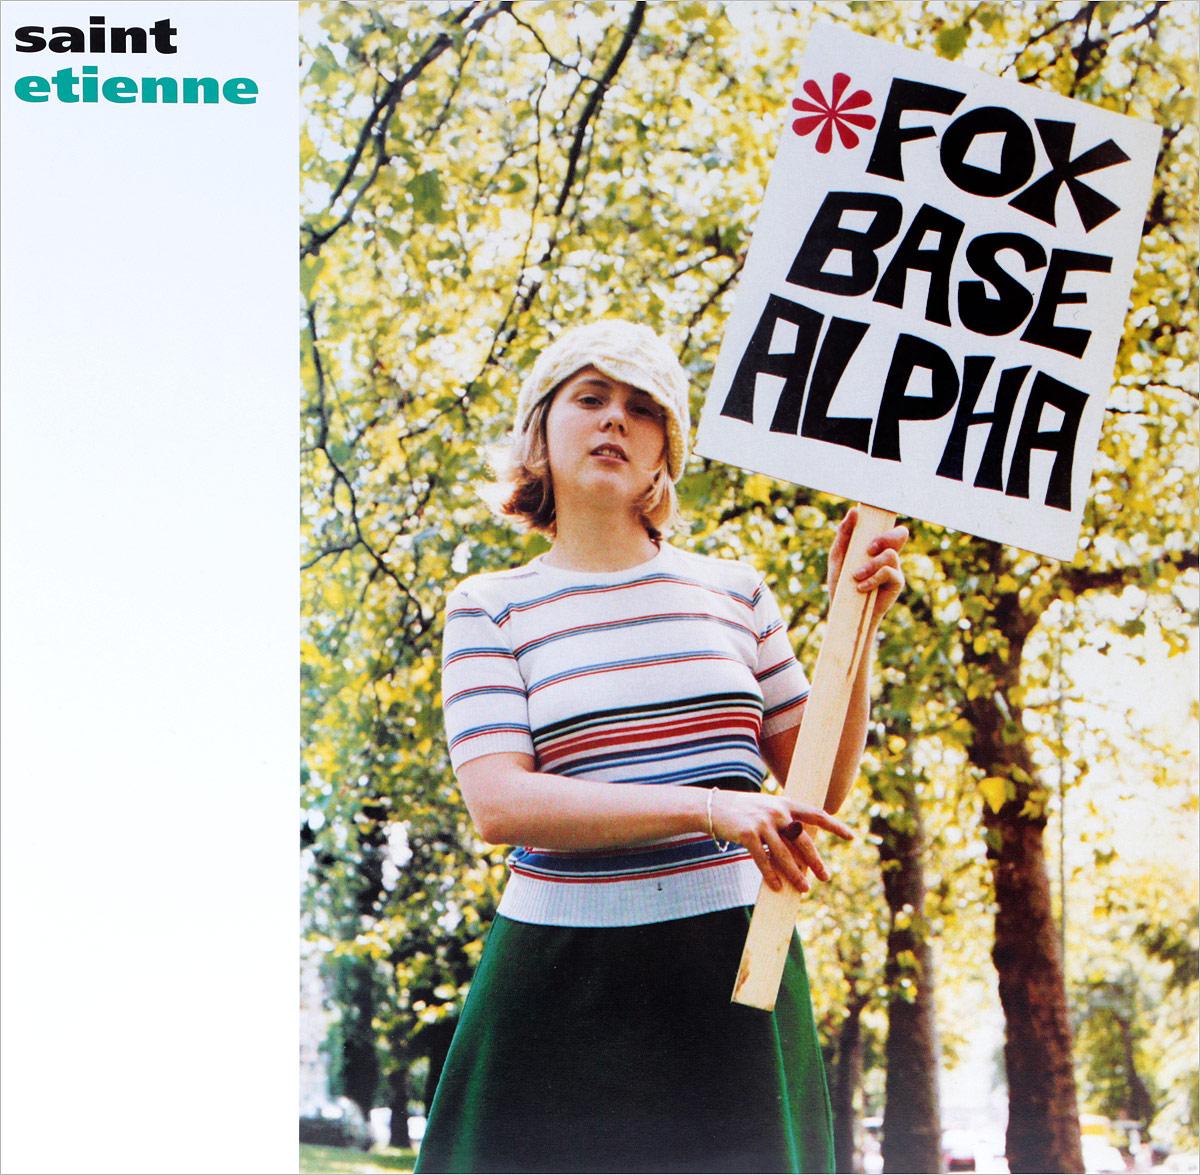 Saint Etienne Saint Etienne. Foxbase Alpha. 25Th Anniversary Edition (LP) batman arkham asylum 25th anniversary deluxe edition